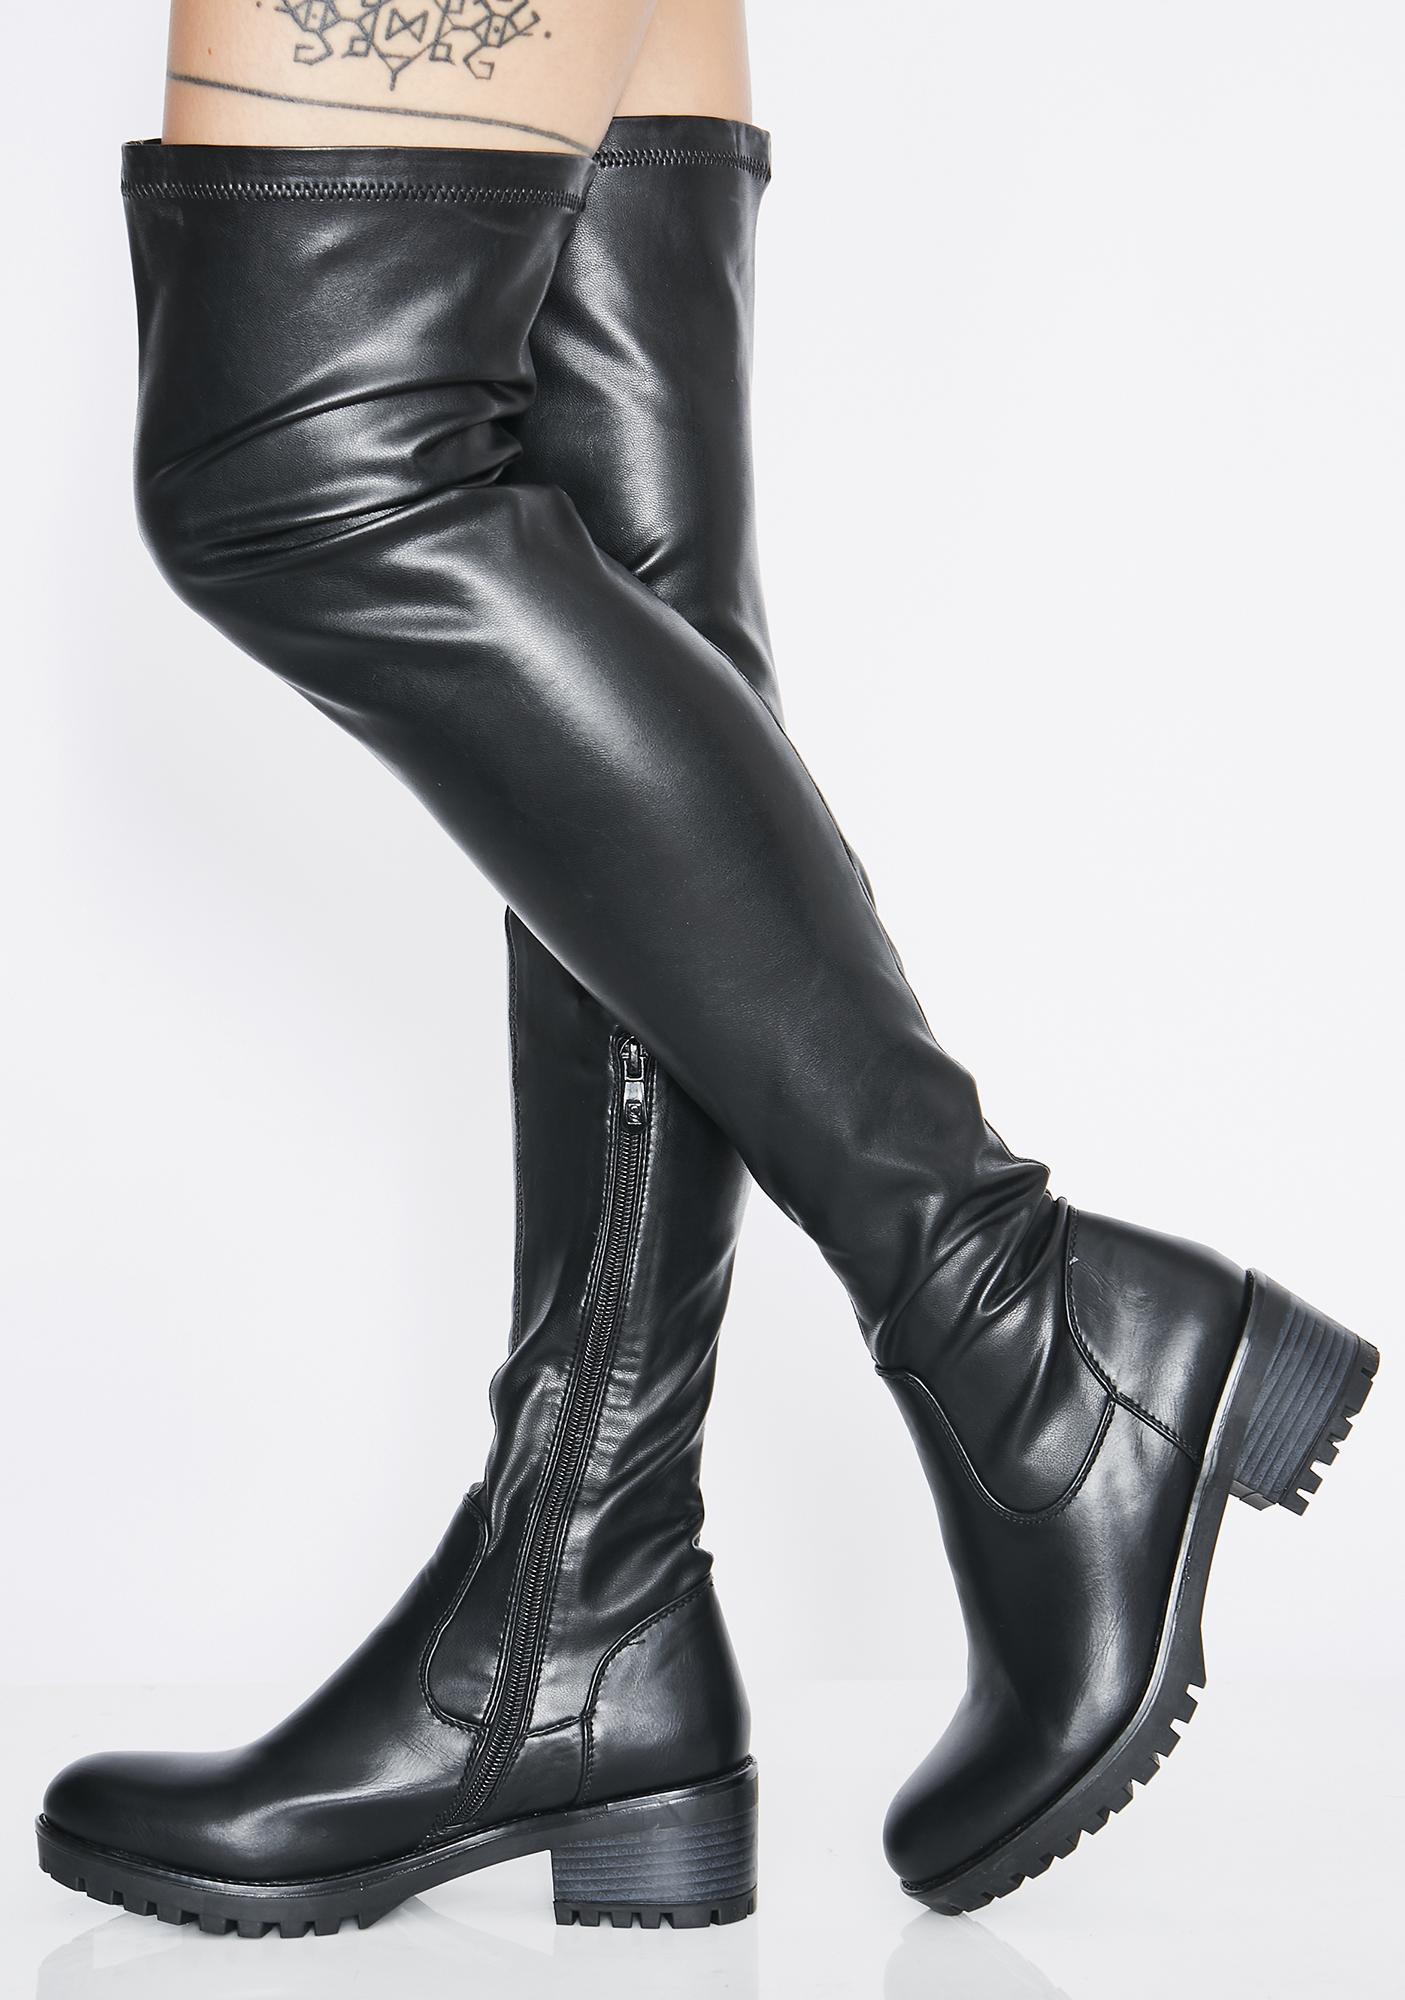 AZALEA WANG Eureva Over The Knee Boots